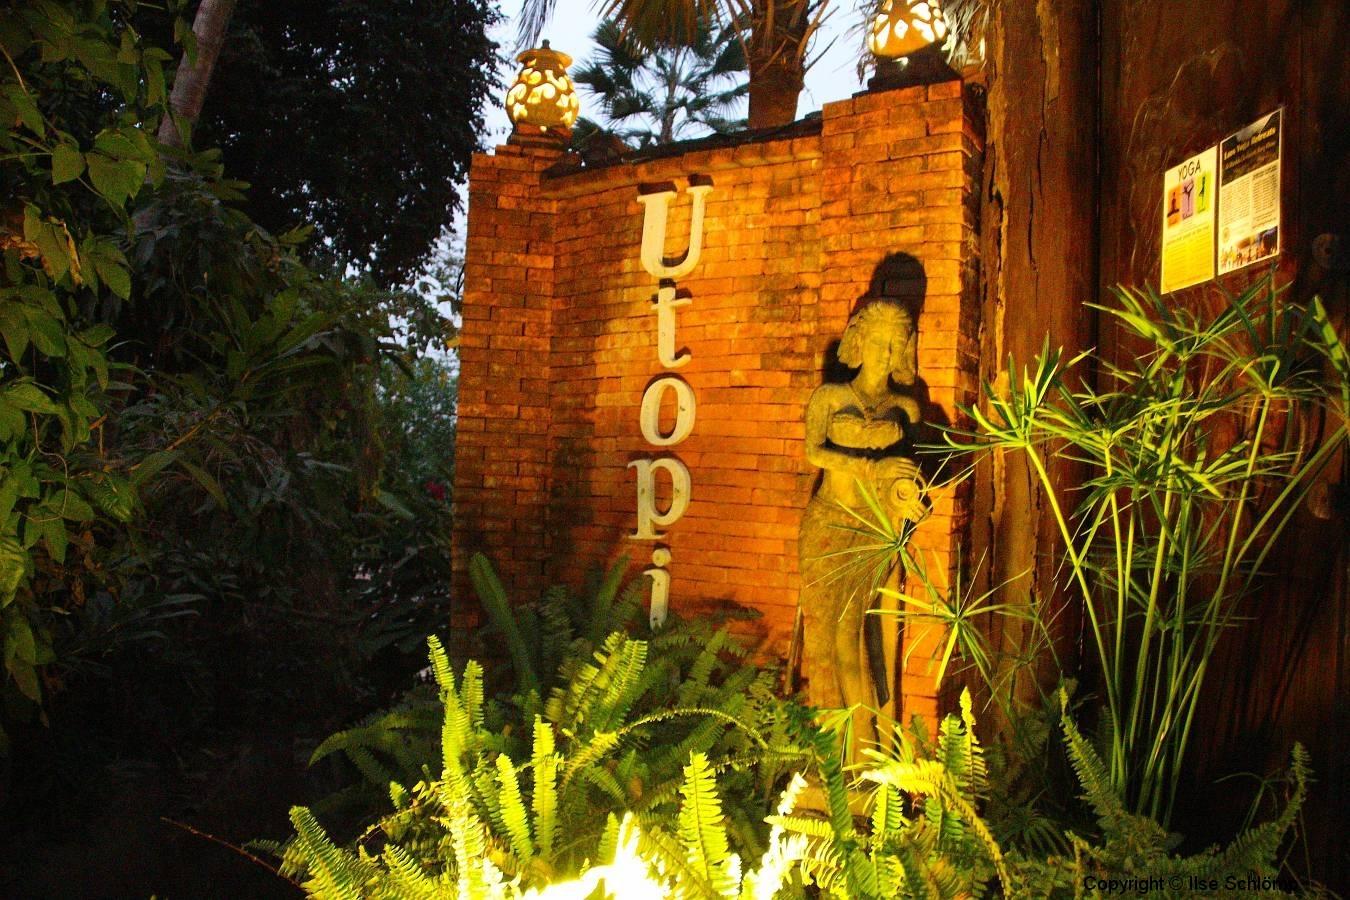 Laos, Luang Prabang, Utopia